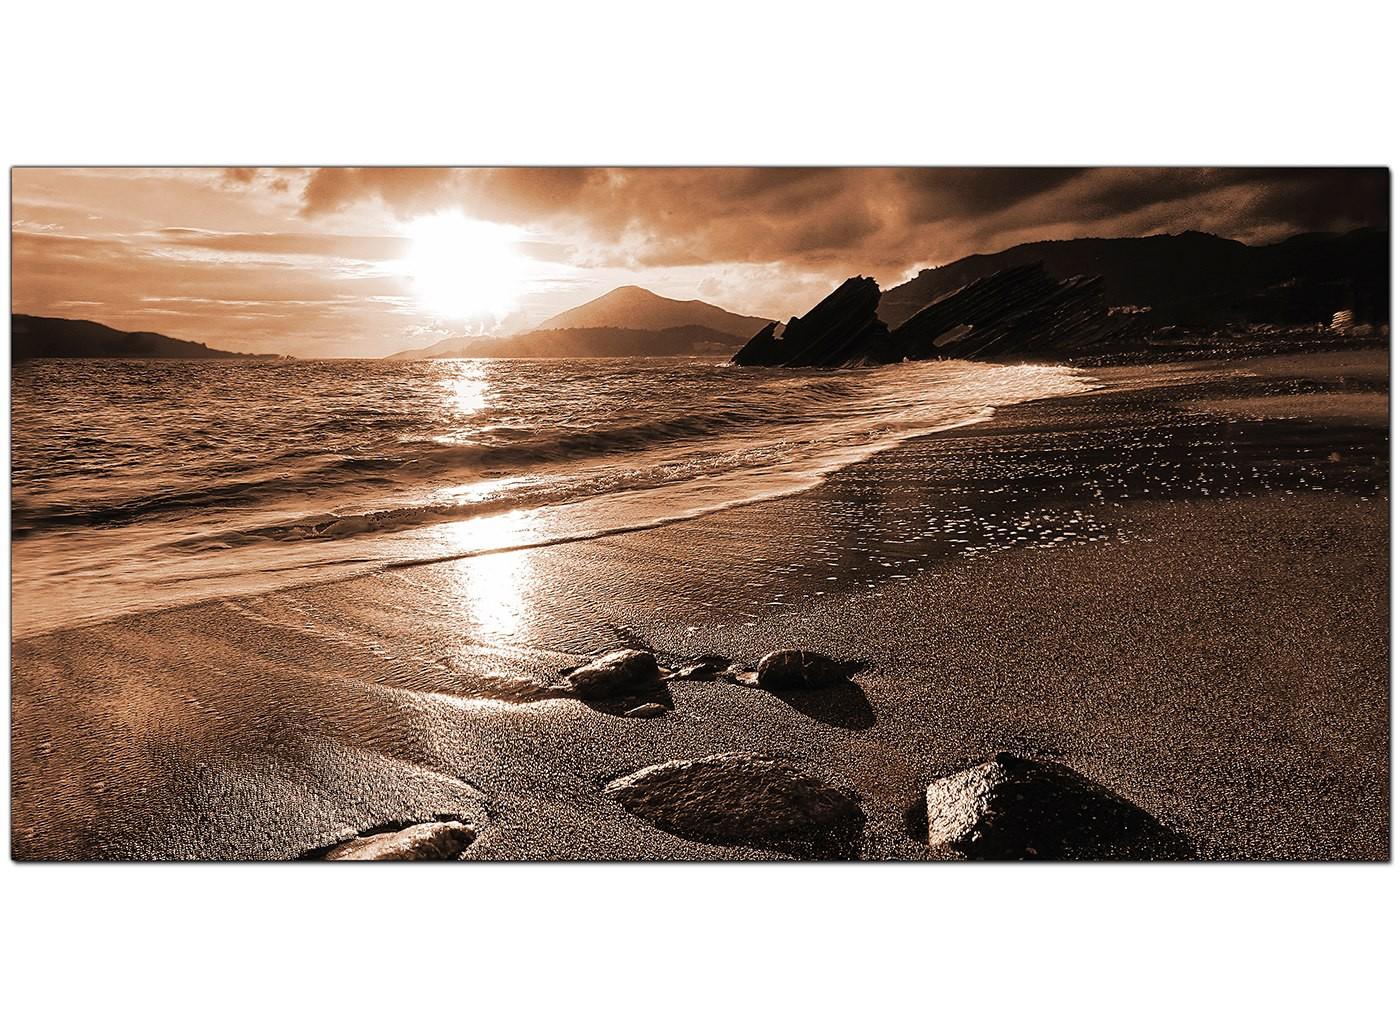 Modern Brown Canvas Prints Of A Beach Sunset